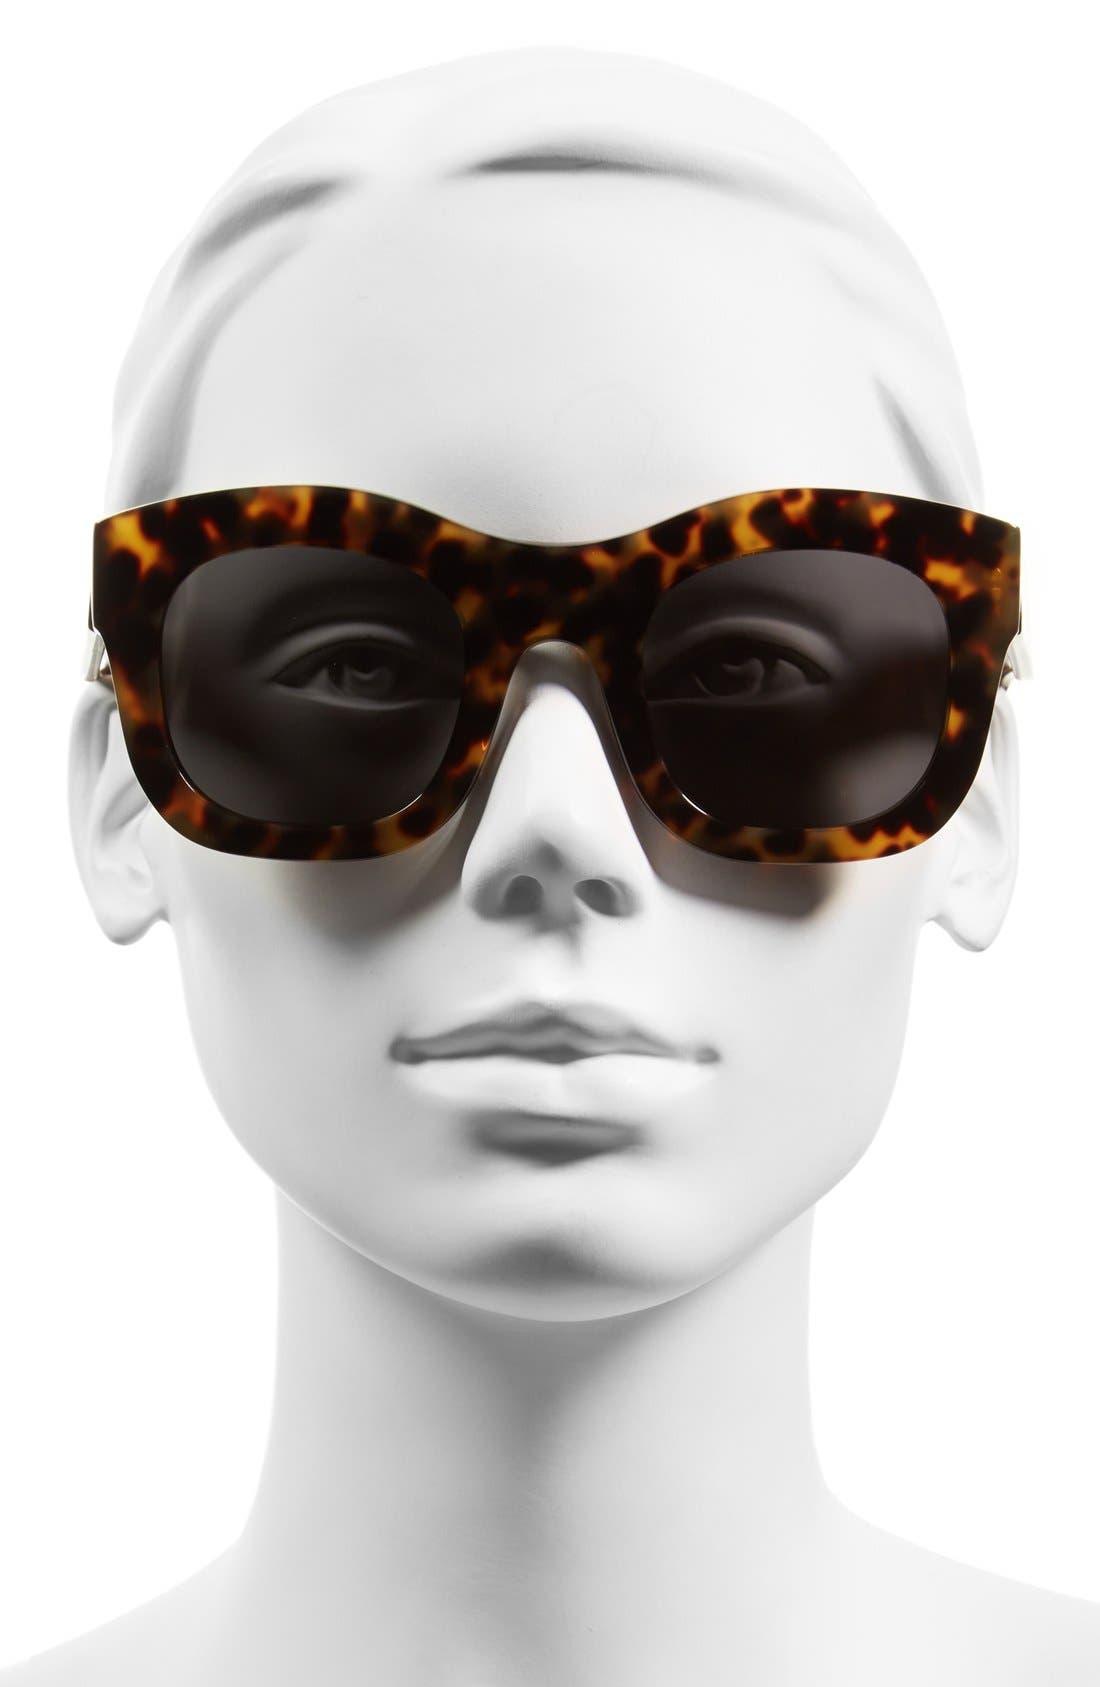 'Hamilton' 49mm Retro Sunglasses,                             Alternate thumbnail 16, color,